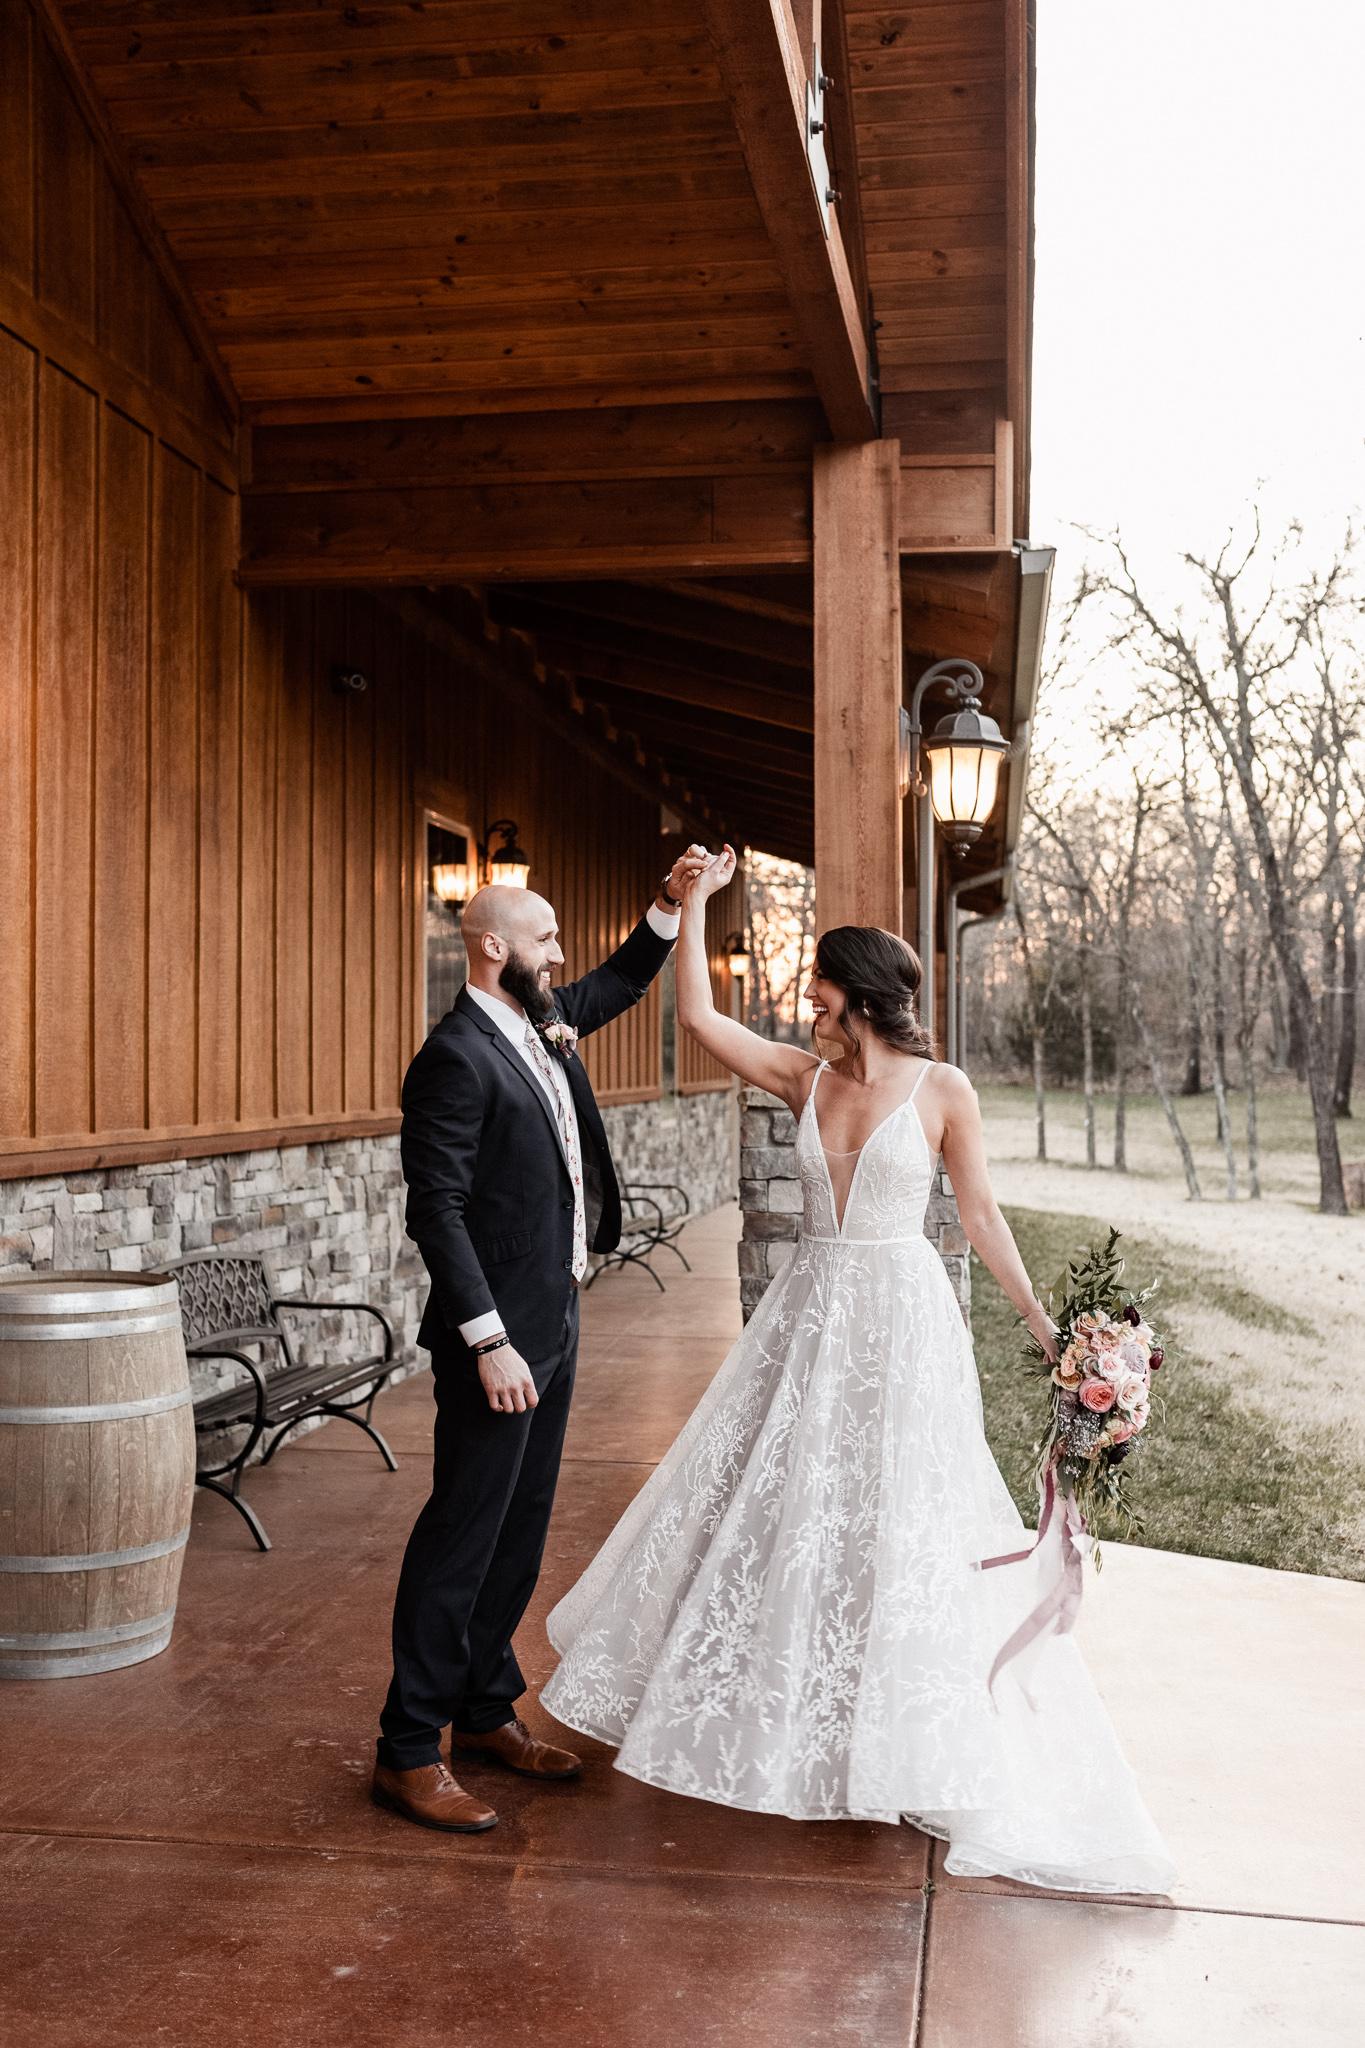 Cultivate Event Planning Styled Shoot   Colorful Romantic Barn Wedding Inspo   Oklahoma Wedding Photographer-161.jpg